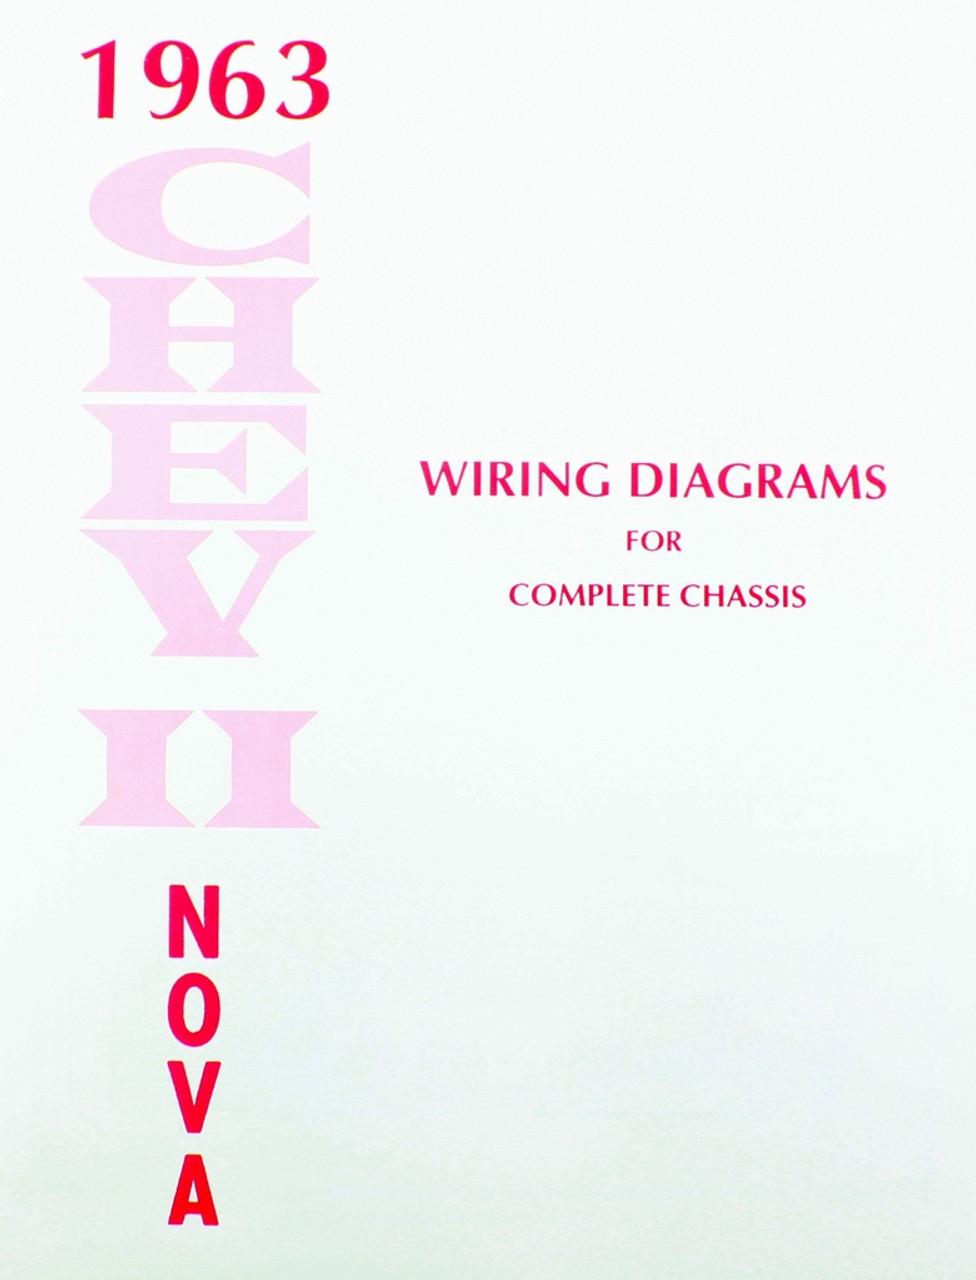 63 1963 chevy nova electrical wiring diagram manual [ 976 x 1280 Pixel ]